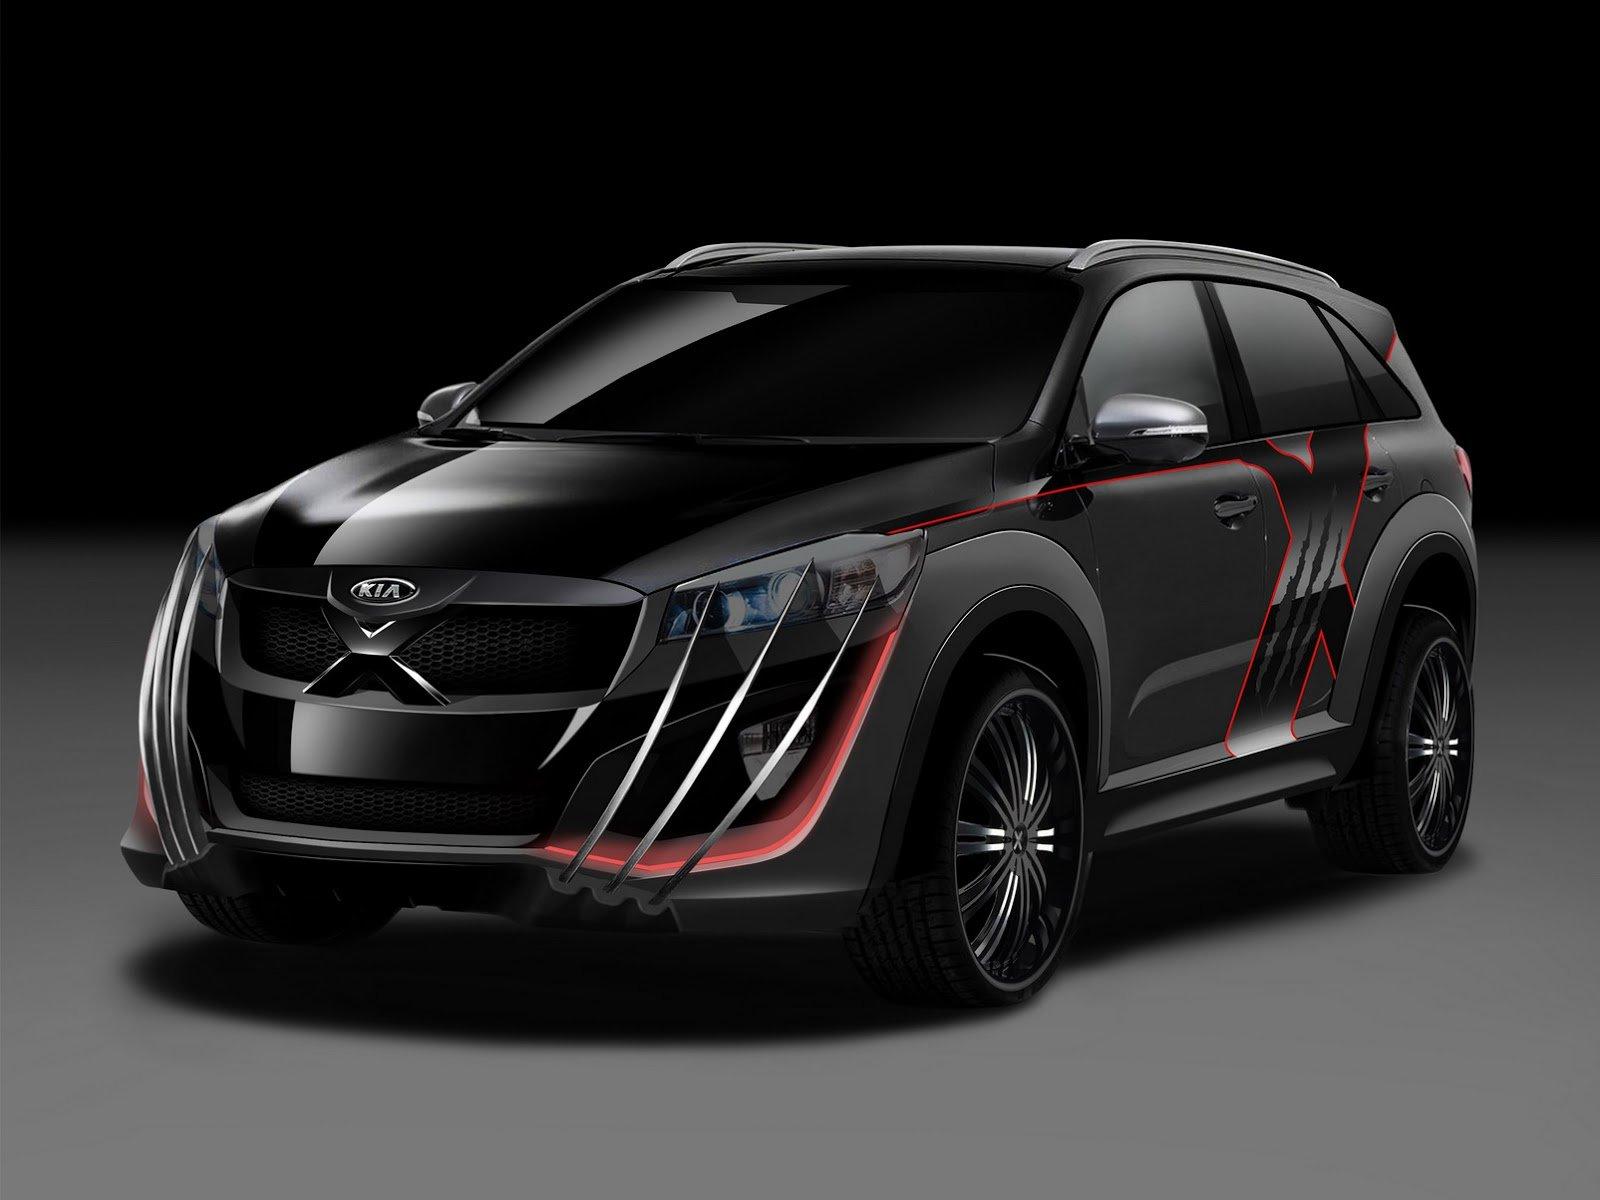 Kia Sorento Wolverine Suv Cars Wallpaper 1600x1200